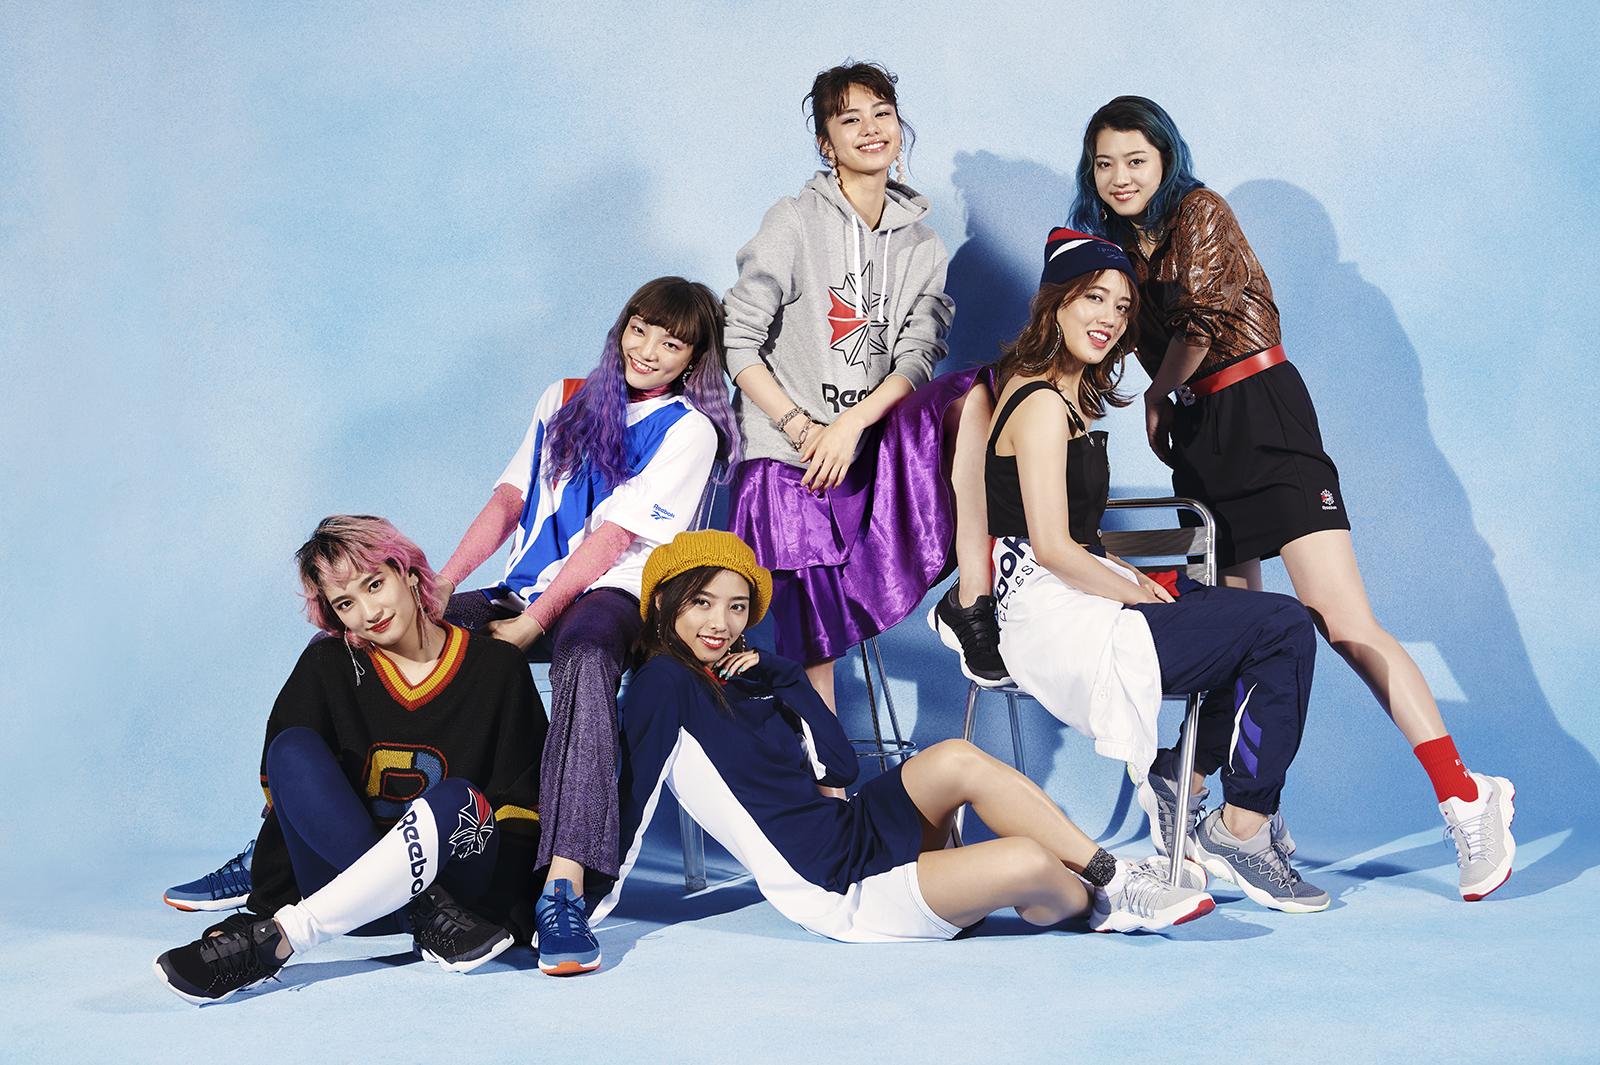 「Reebok」キービジュアルに起用されたE-girls(提供写真)